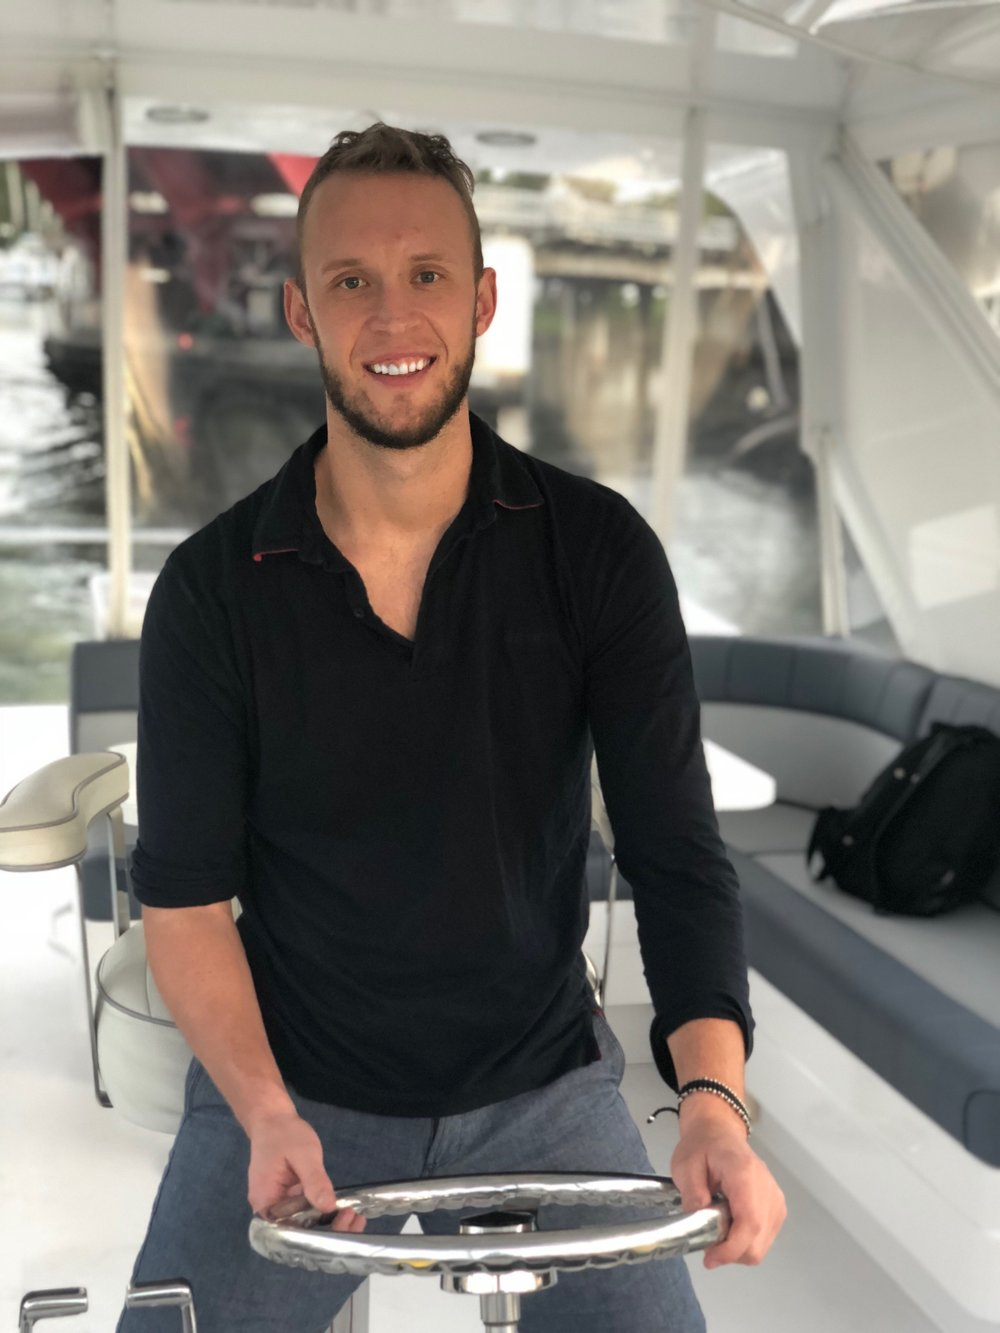 ANTHONY BARTON - Favorite Yacht: 55' Van Dutch